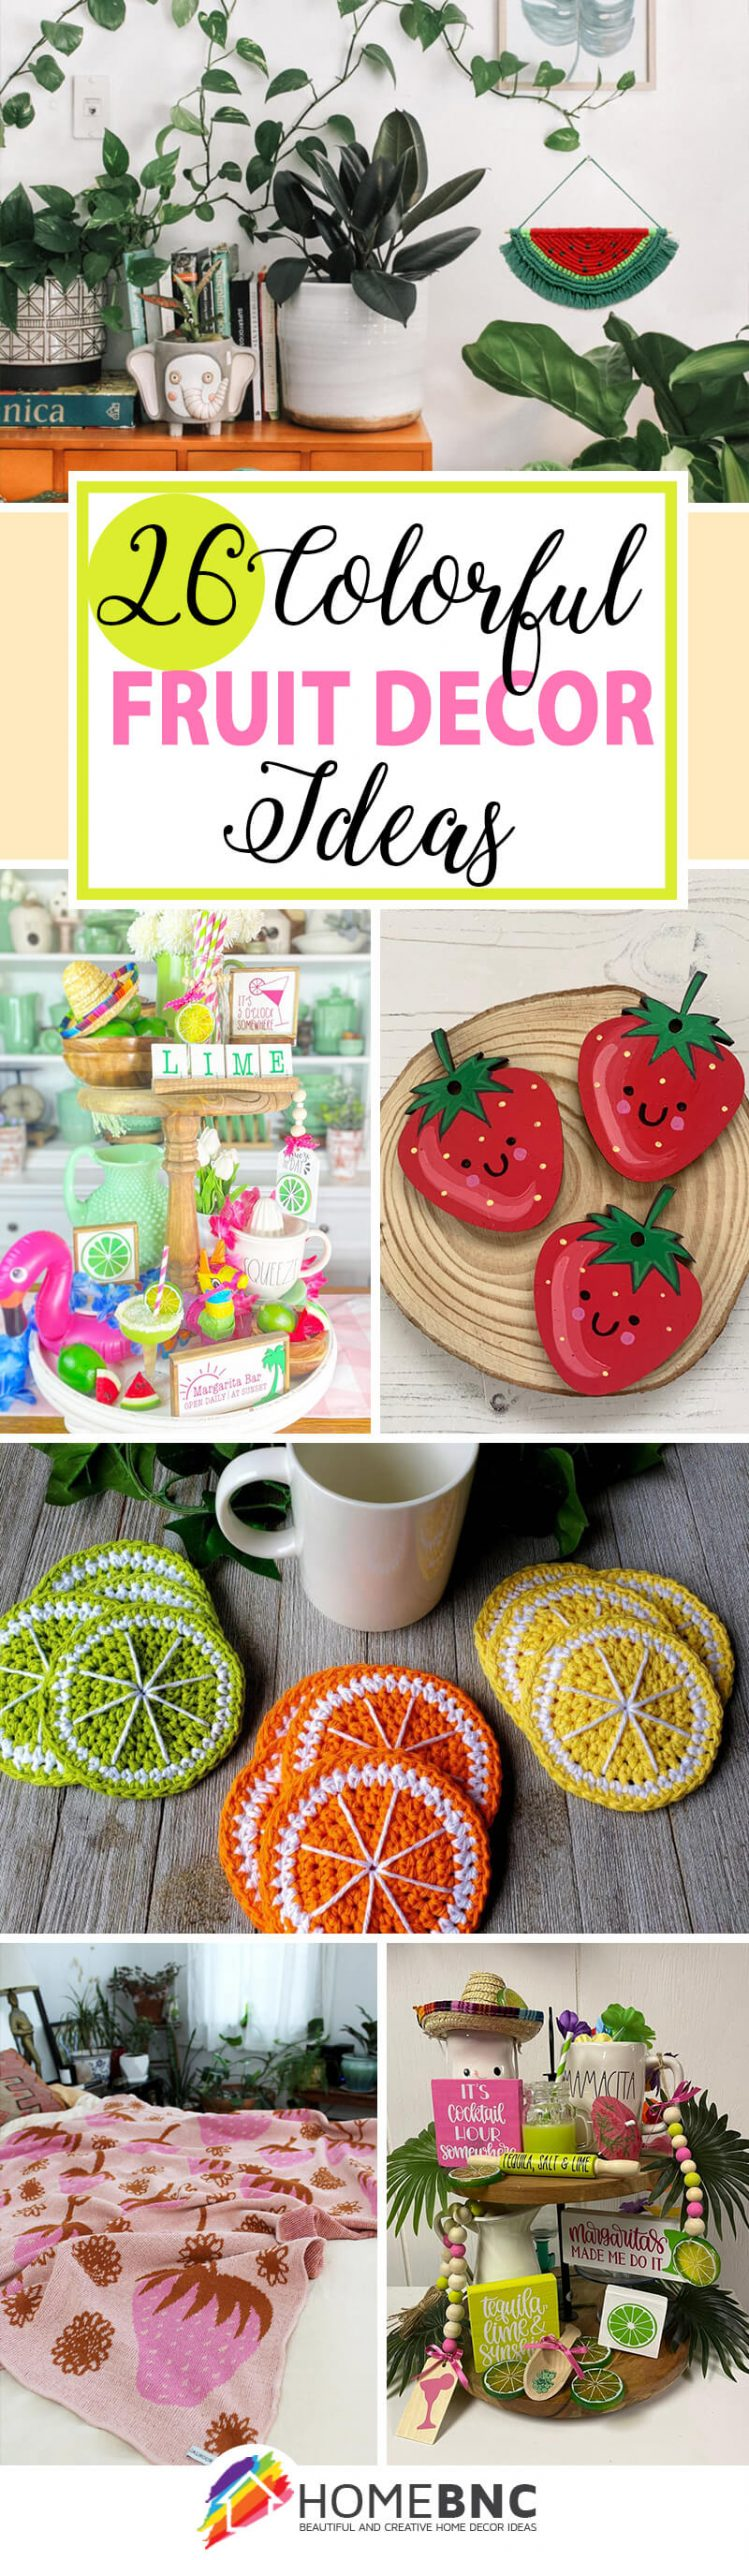 Best Fruit Decor Ideas